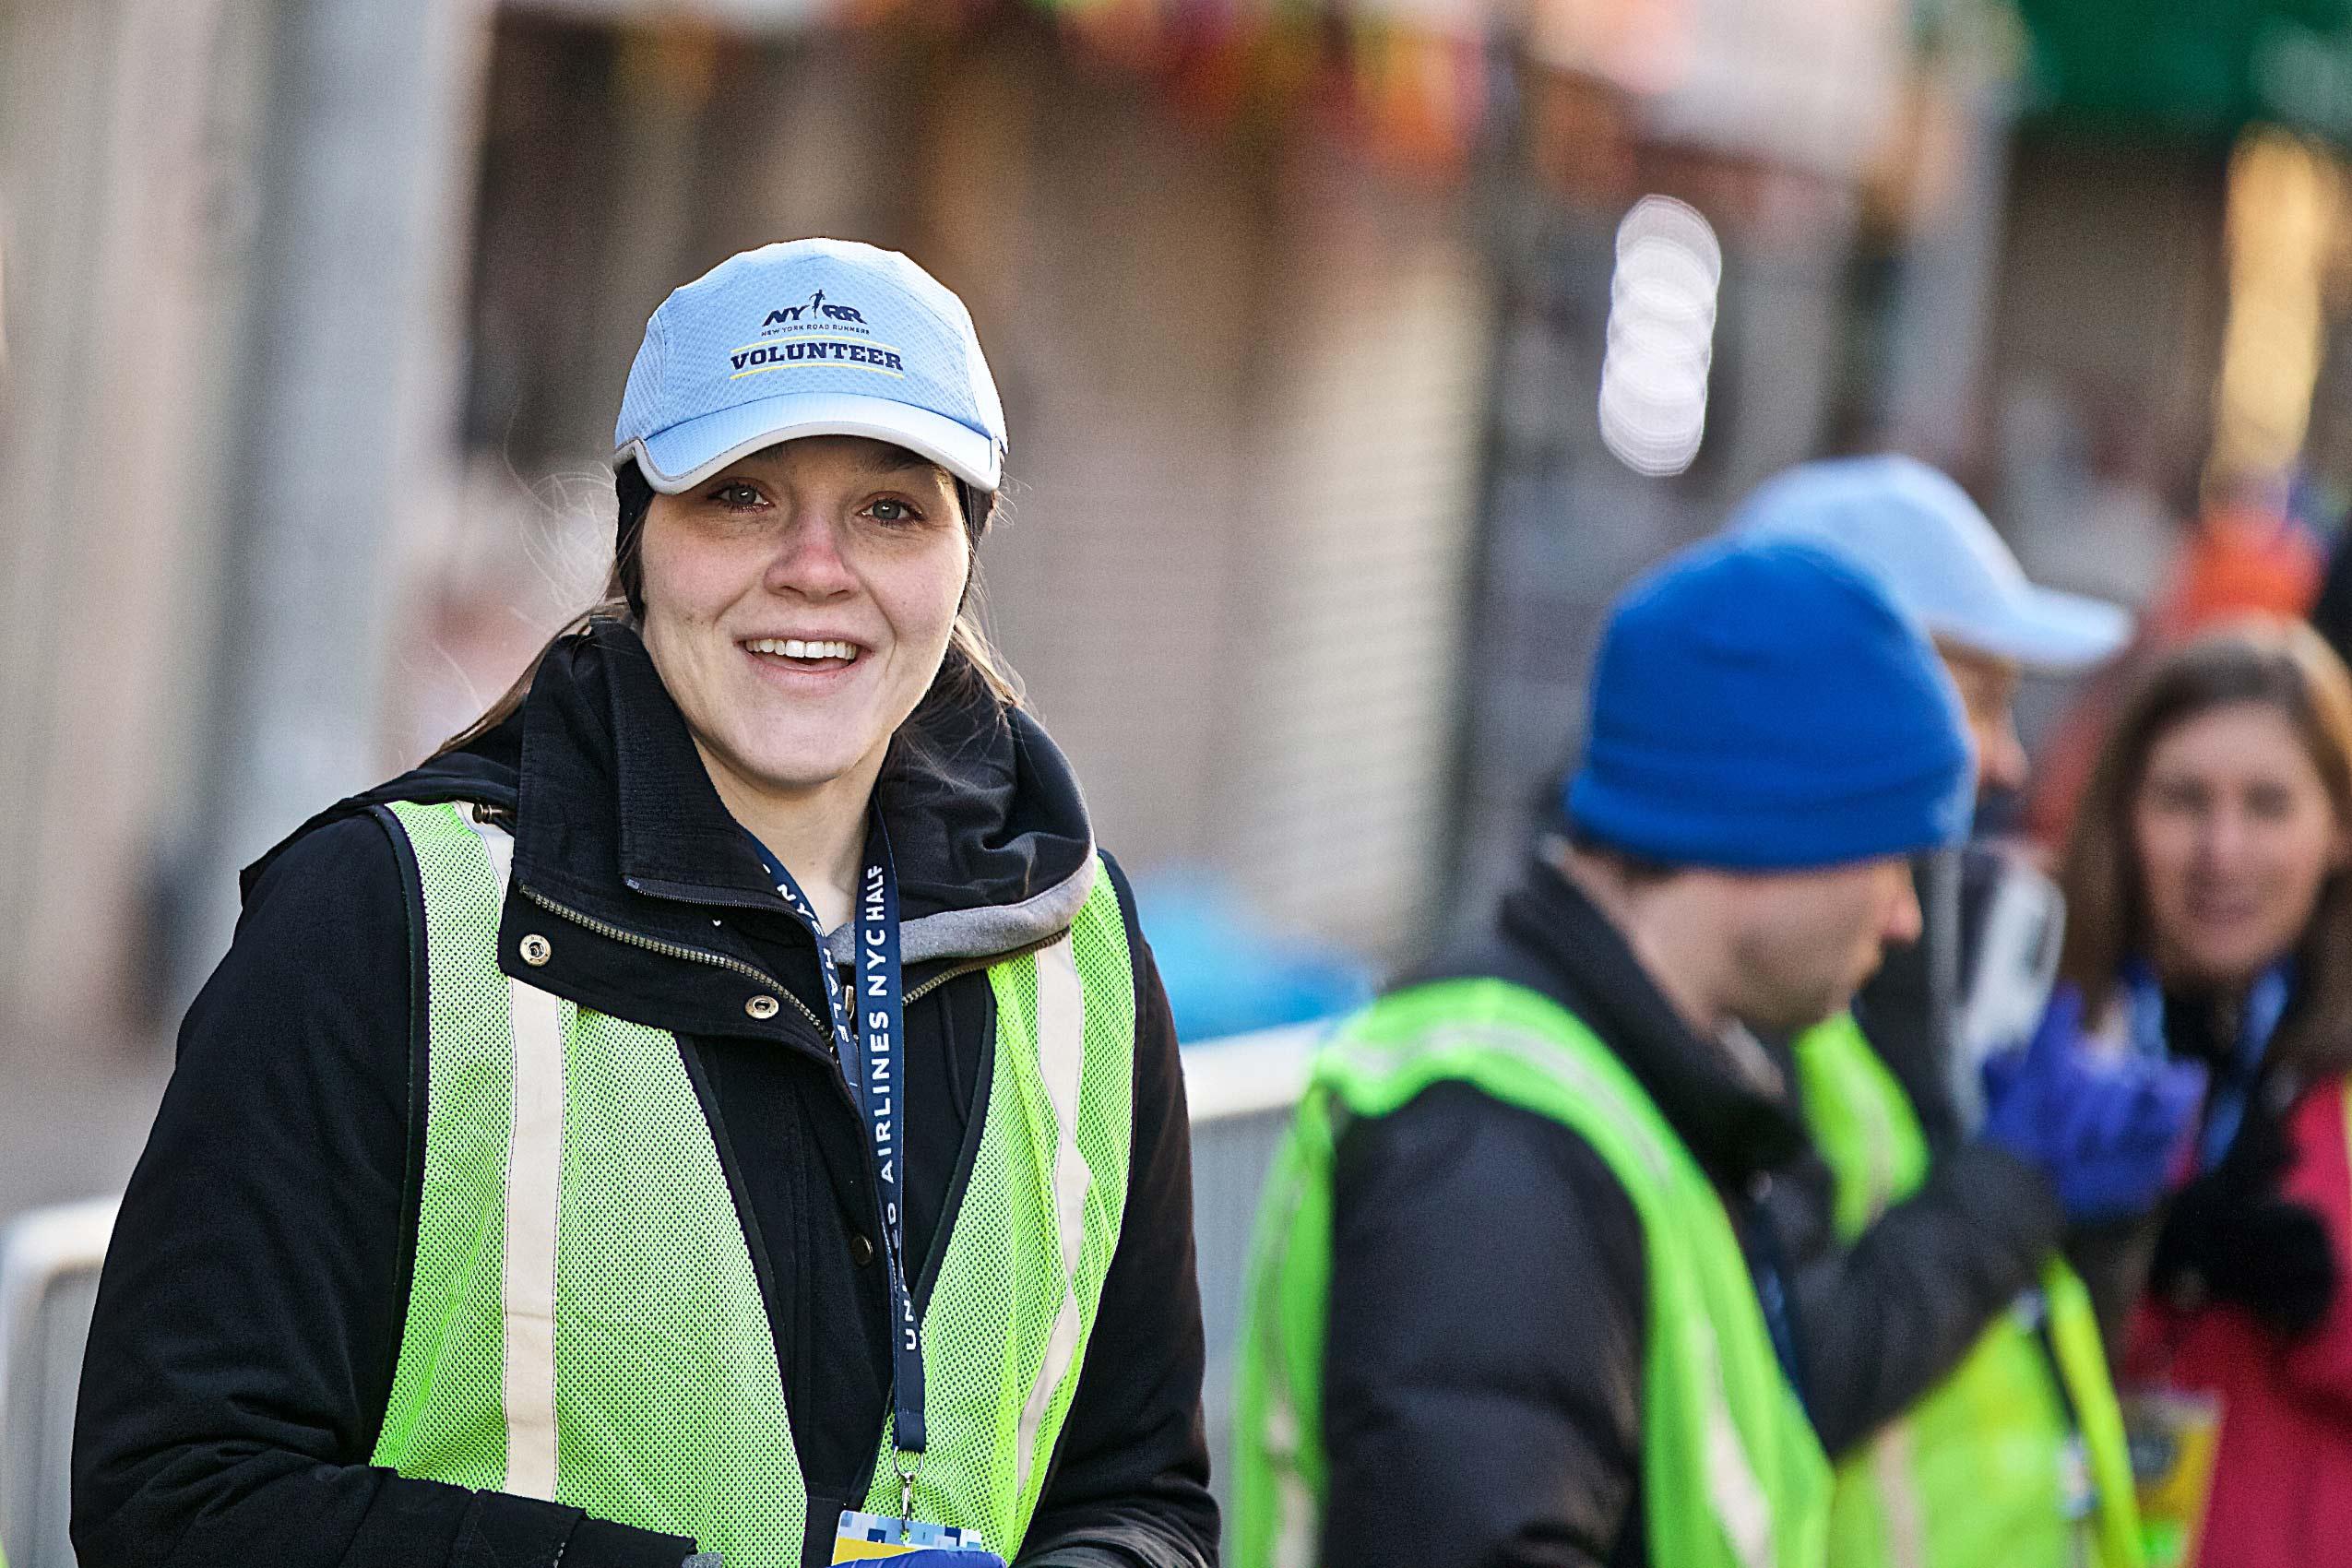 Volunteers at the NYC Half Marathon.